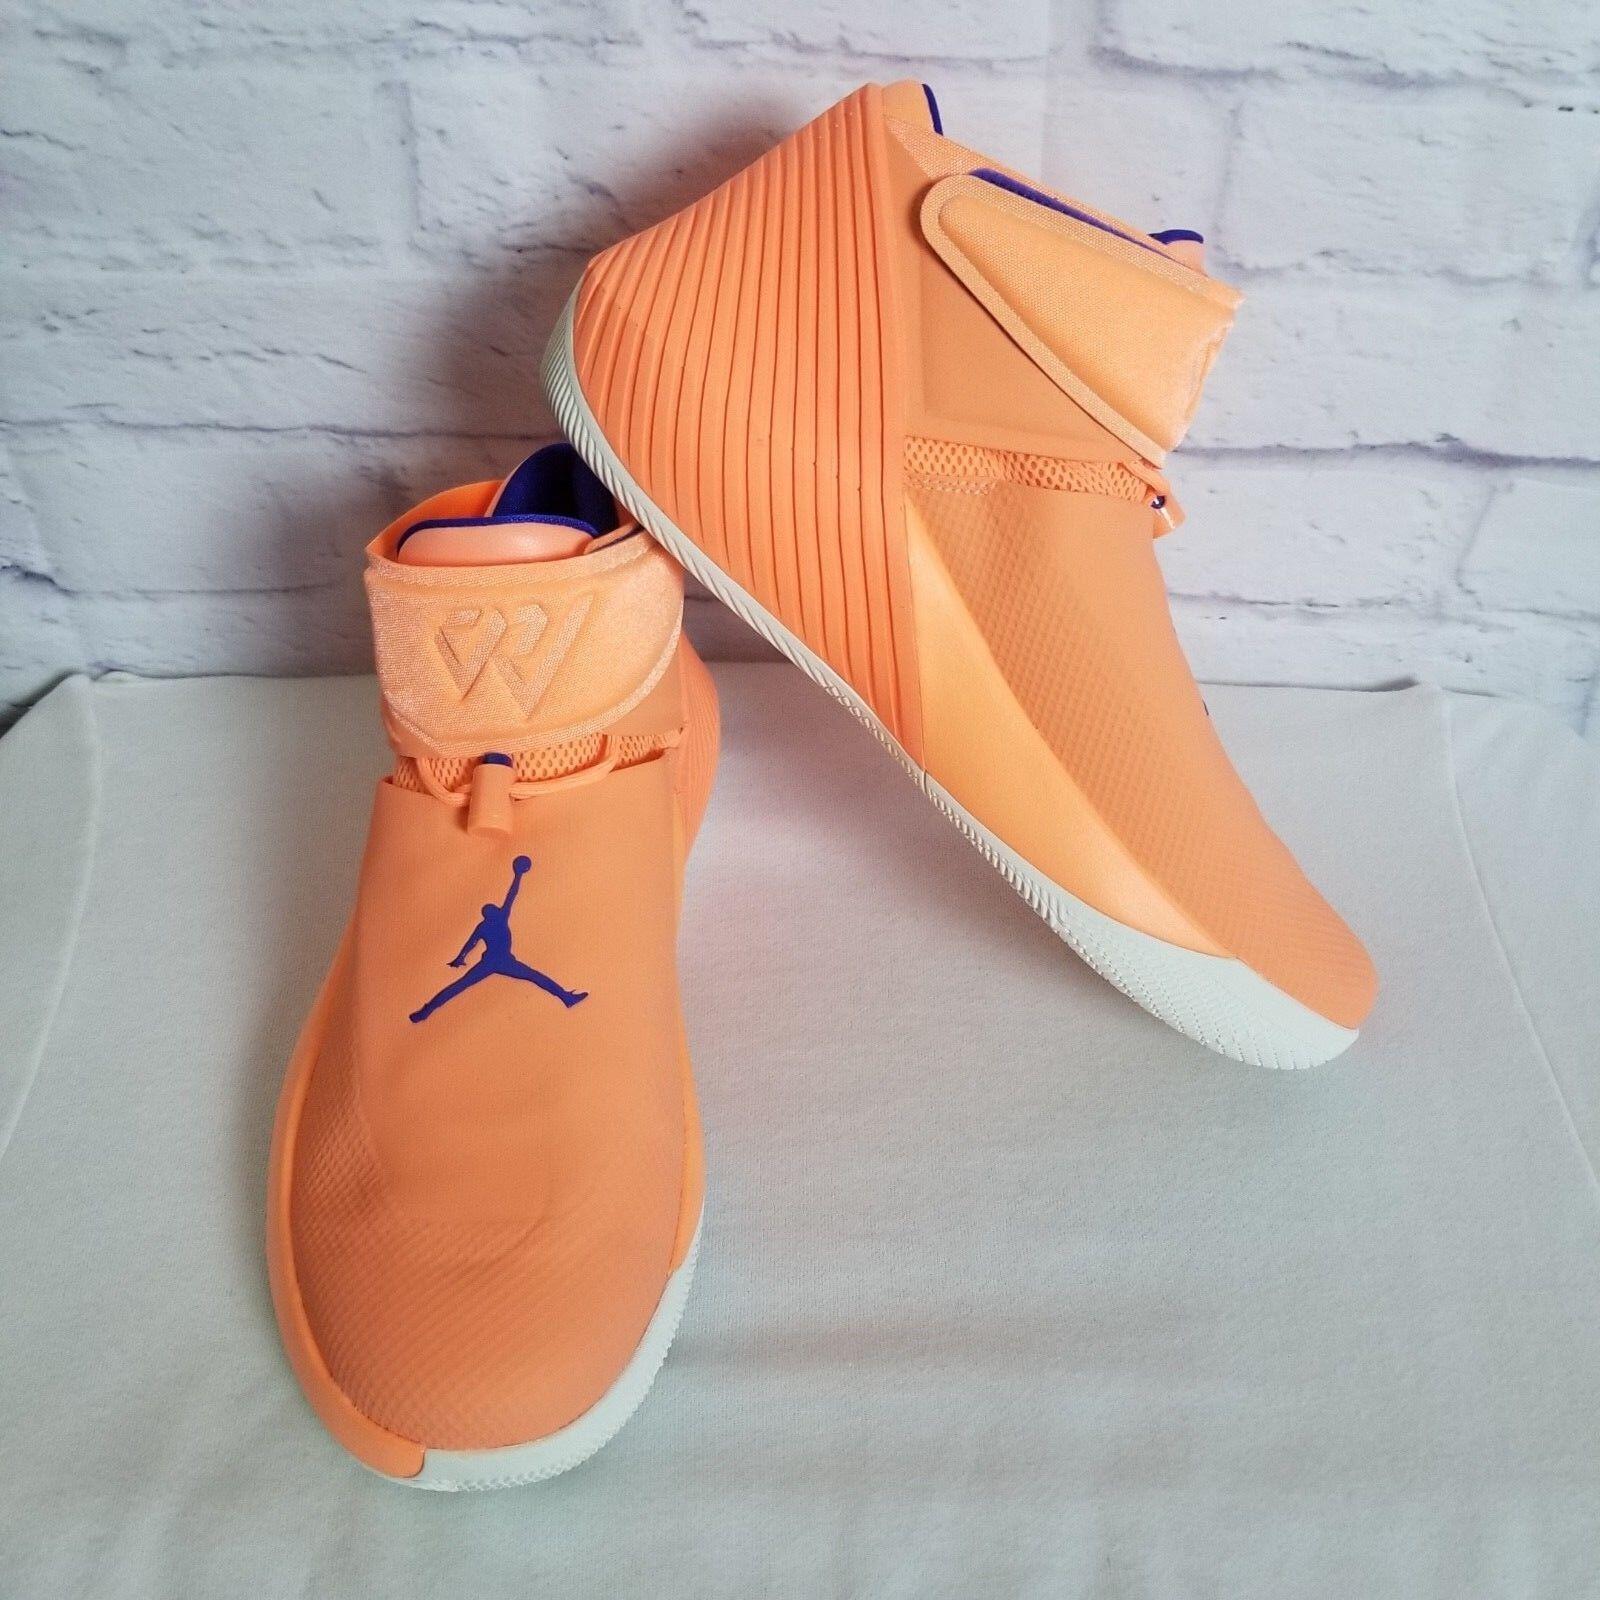 Nike Air Jordan Degli Uomini Perché Non Zero. 1   Taglia 13 Westbrook Orange Polso